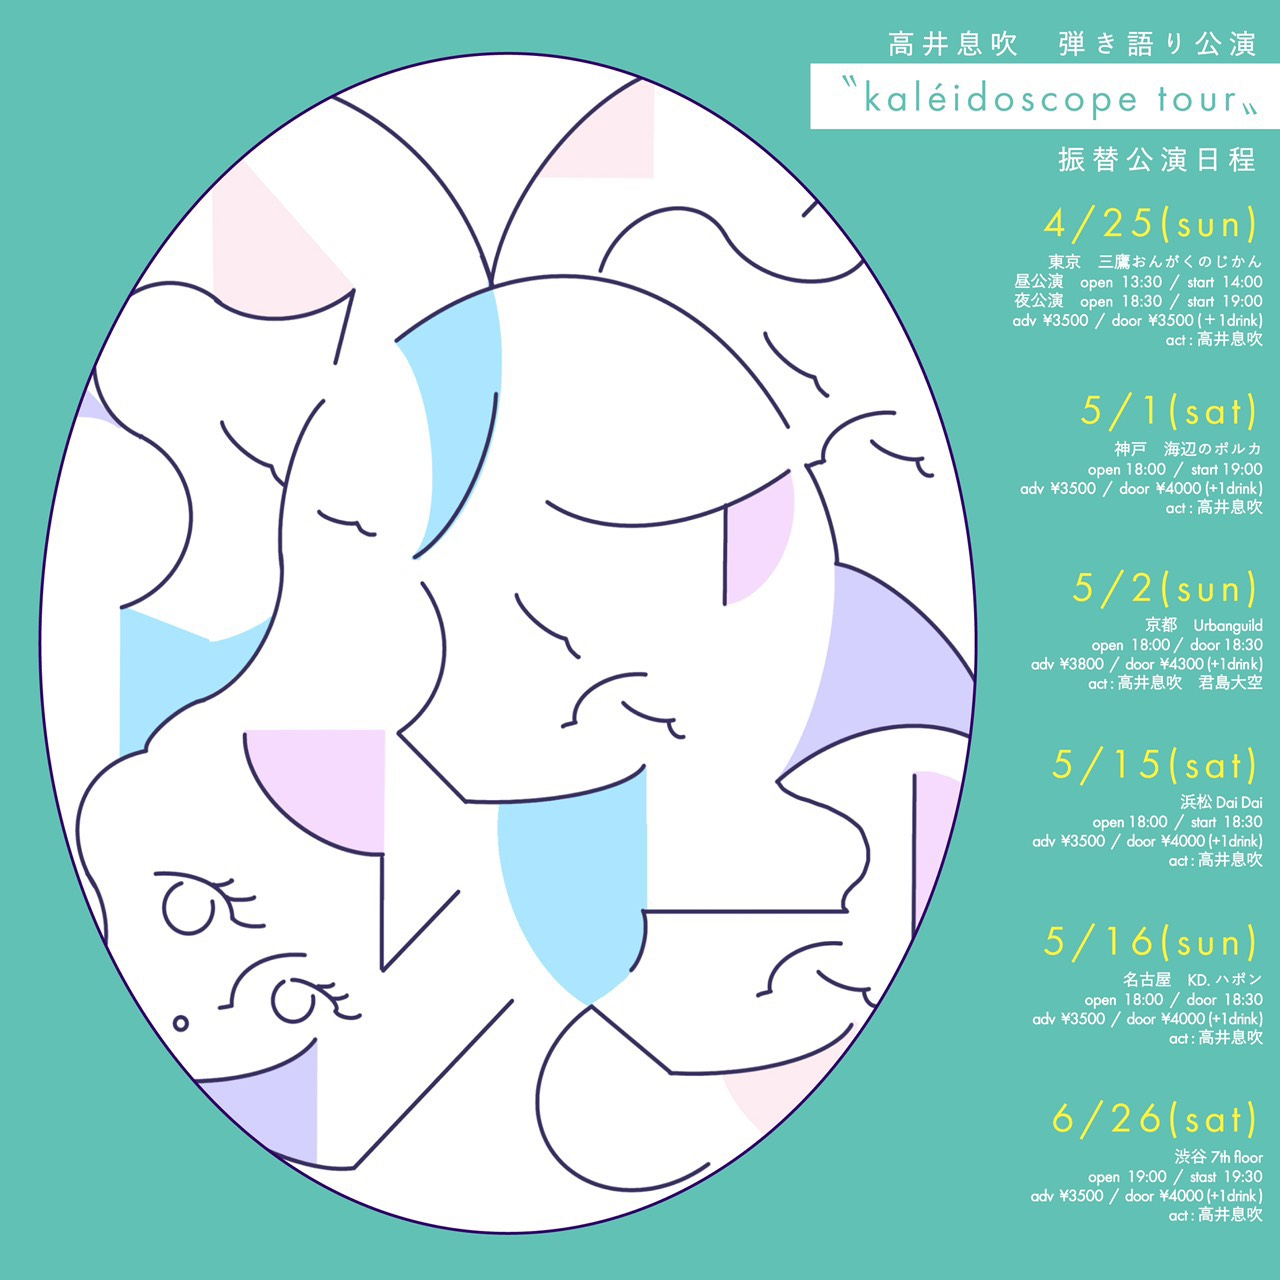 高井息吹 弾き語り公演 〝kaléidoscope tour〟